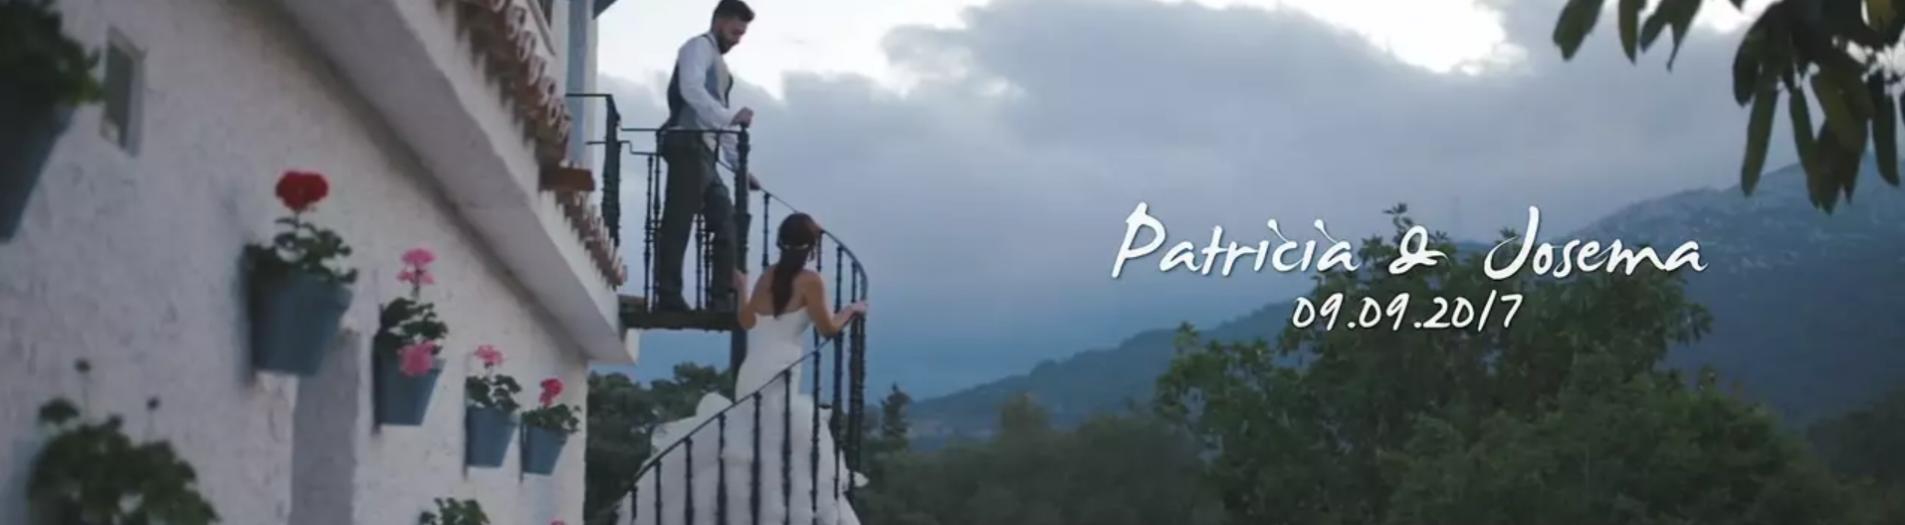 Trailer boda Patri y Josema en La Linea